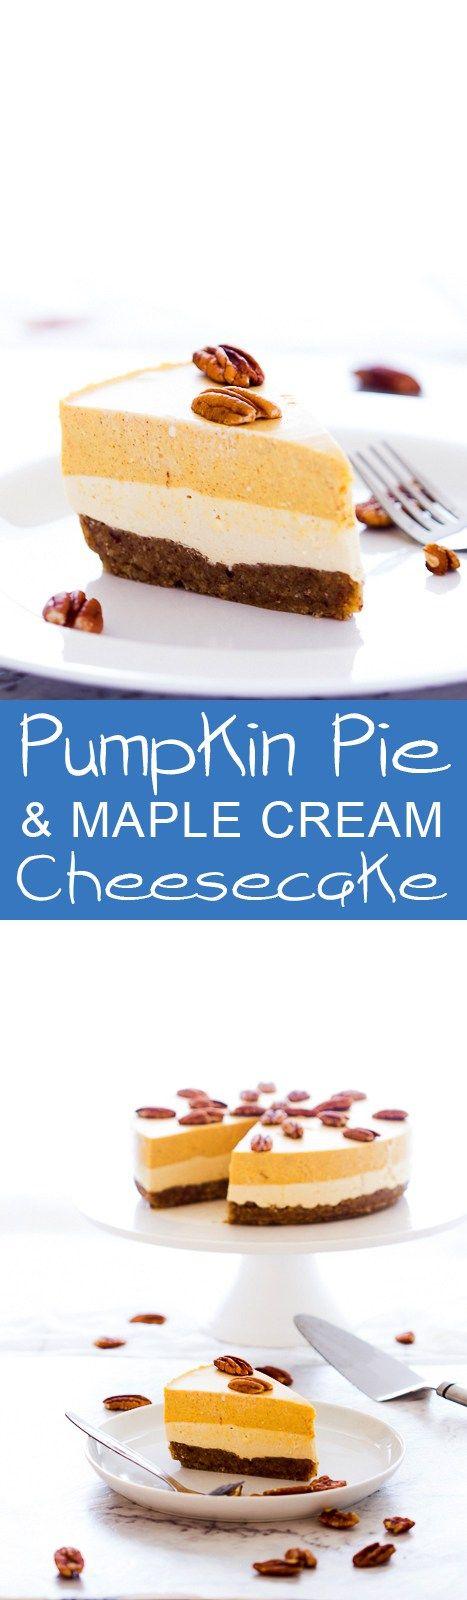 ... cheesecakes on Pinterest | Butterscotch Pie, Buttermilk Pie and Pies